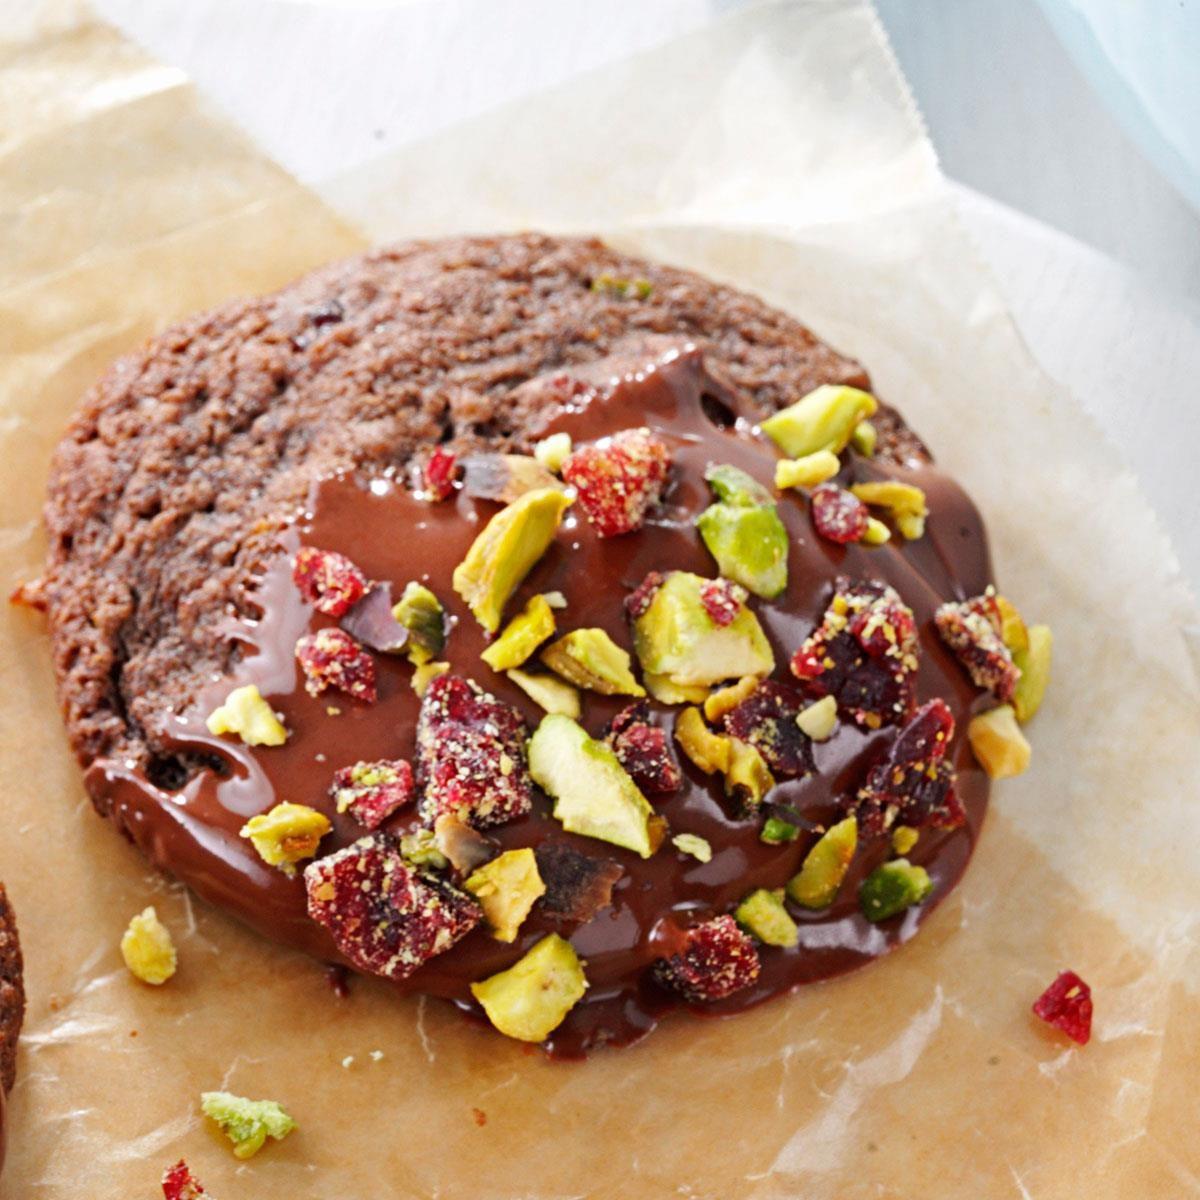 Chocolate-Dipped Spumoni Cookies